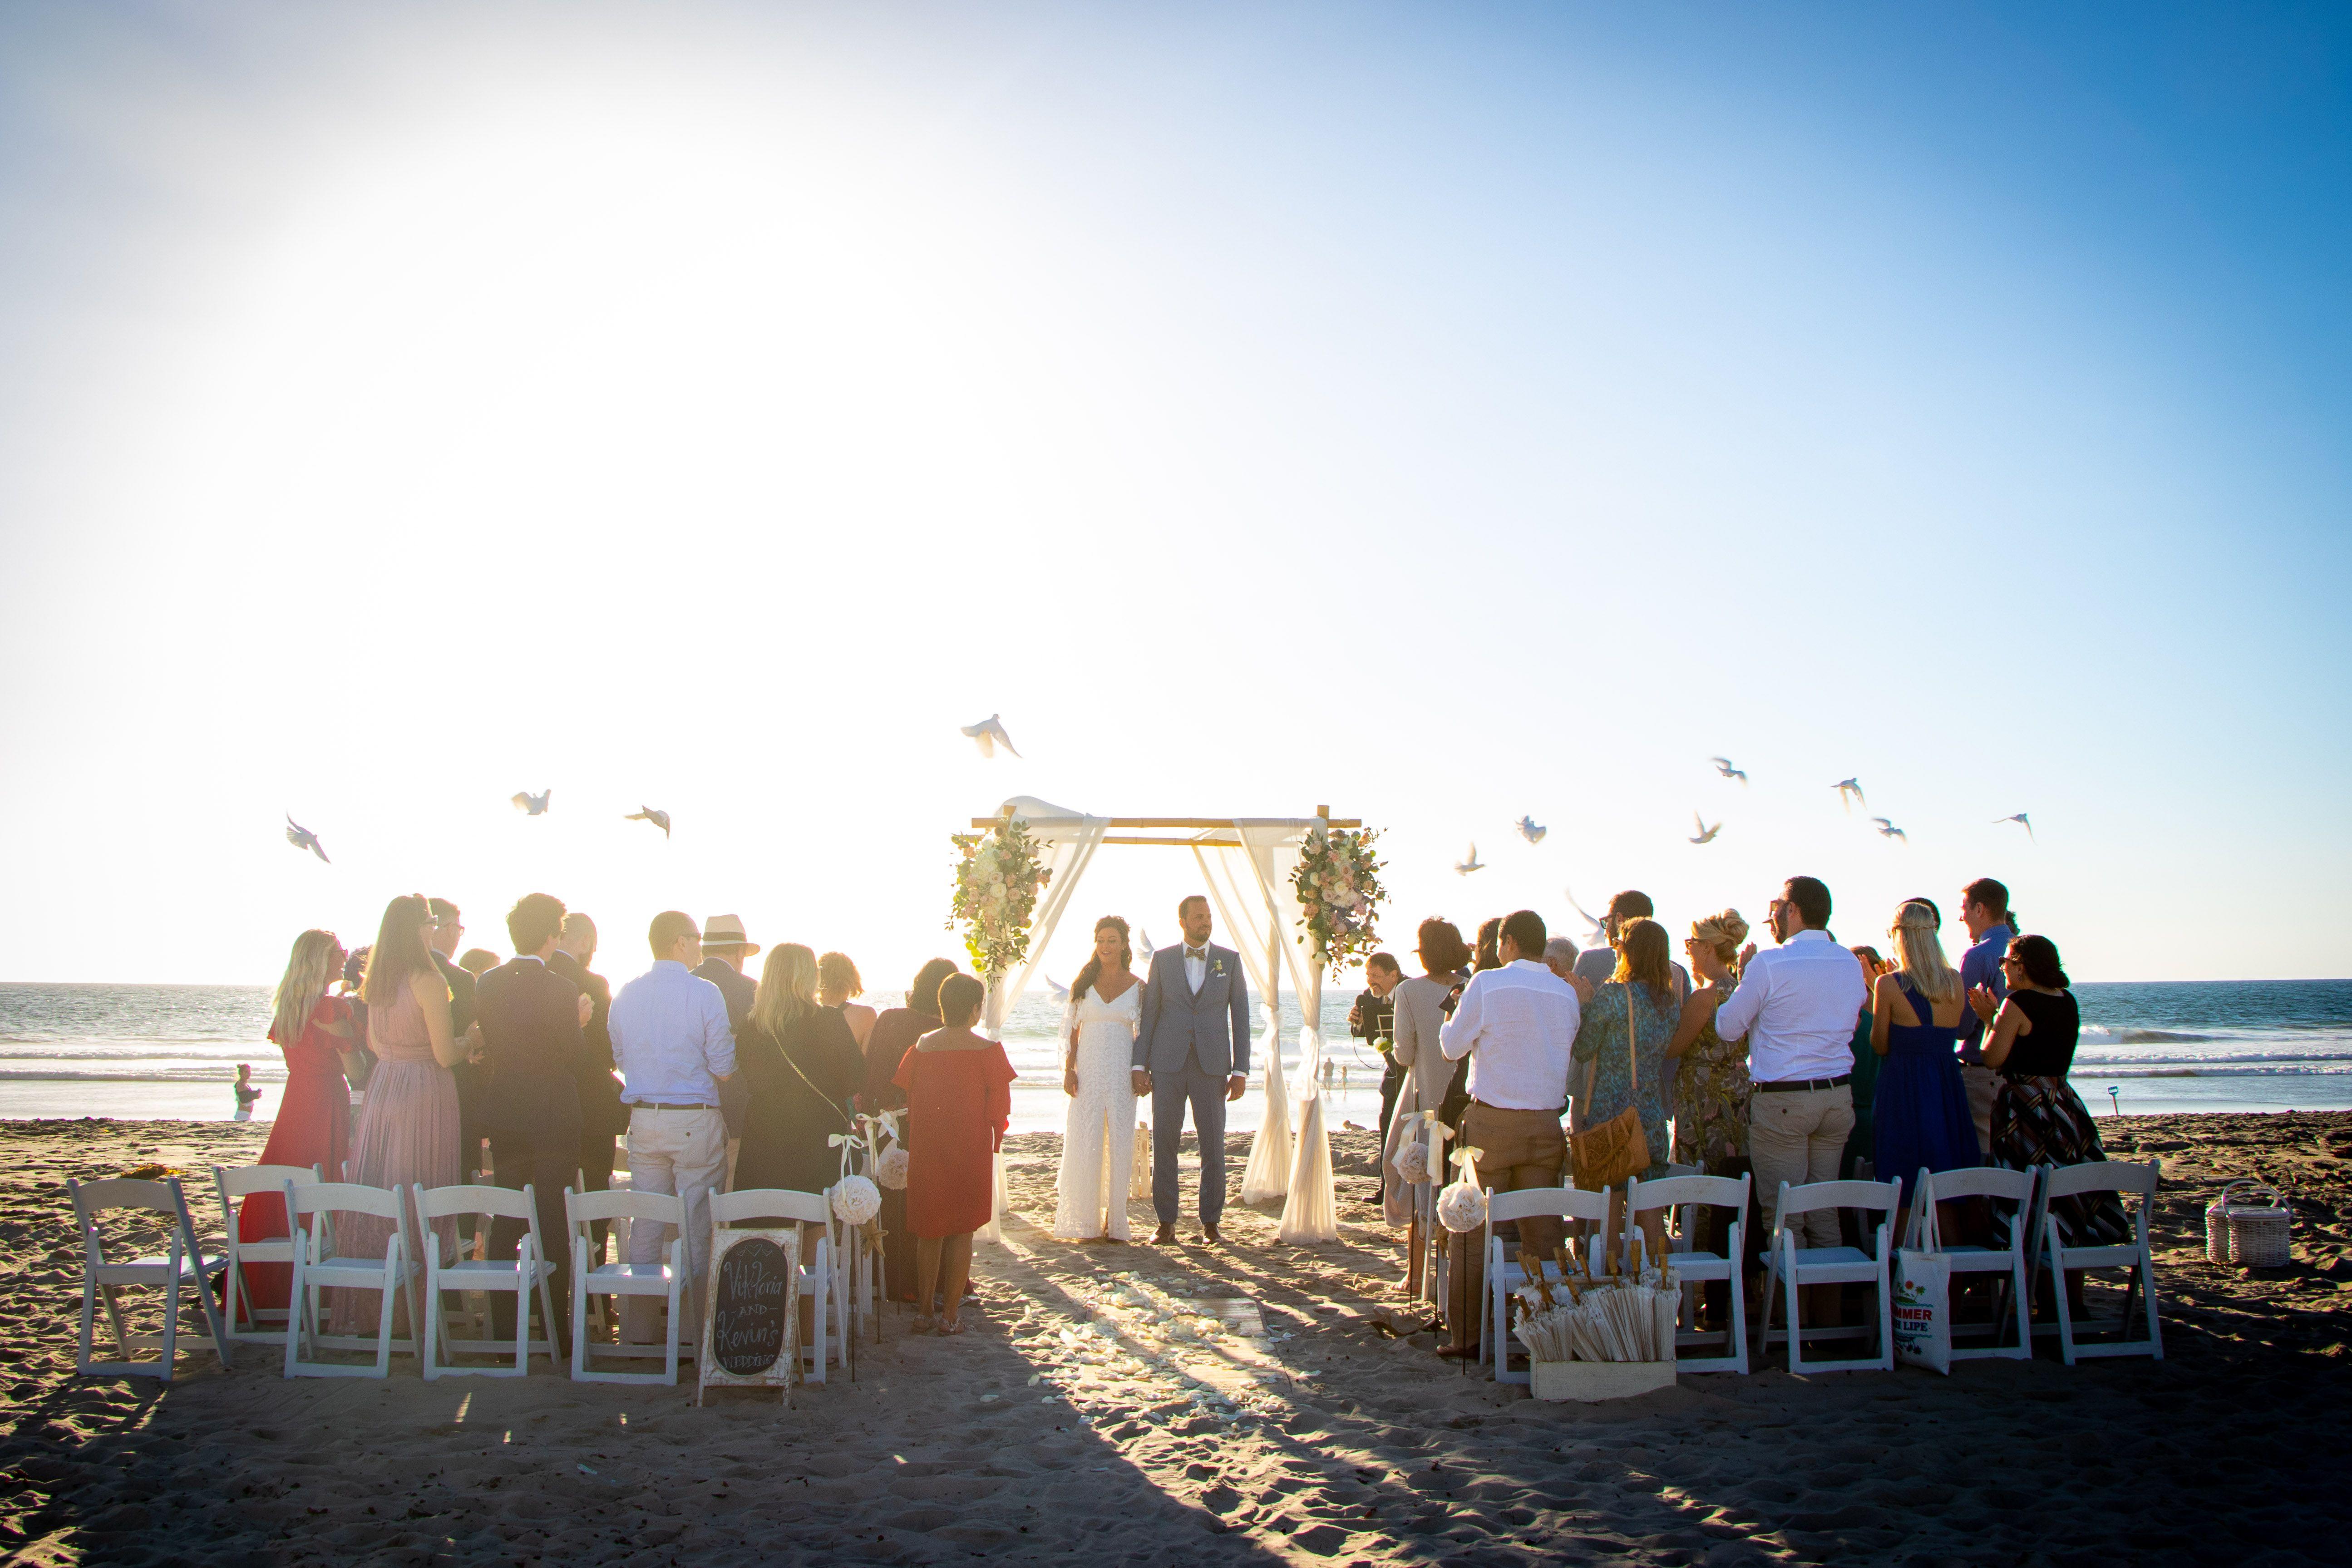 Pin By Dream Beach Wedding San Dieg On Canopies By Dream Beach Wedding San Diego Mission Beach Beach Wedding Planning Wedding Venues Beach